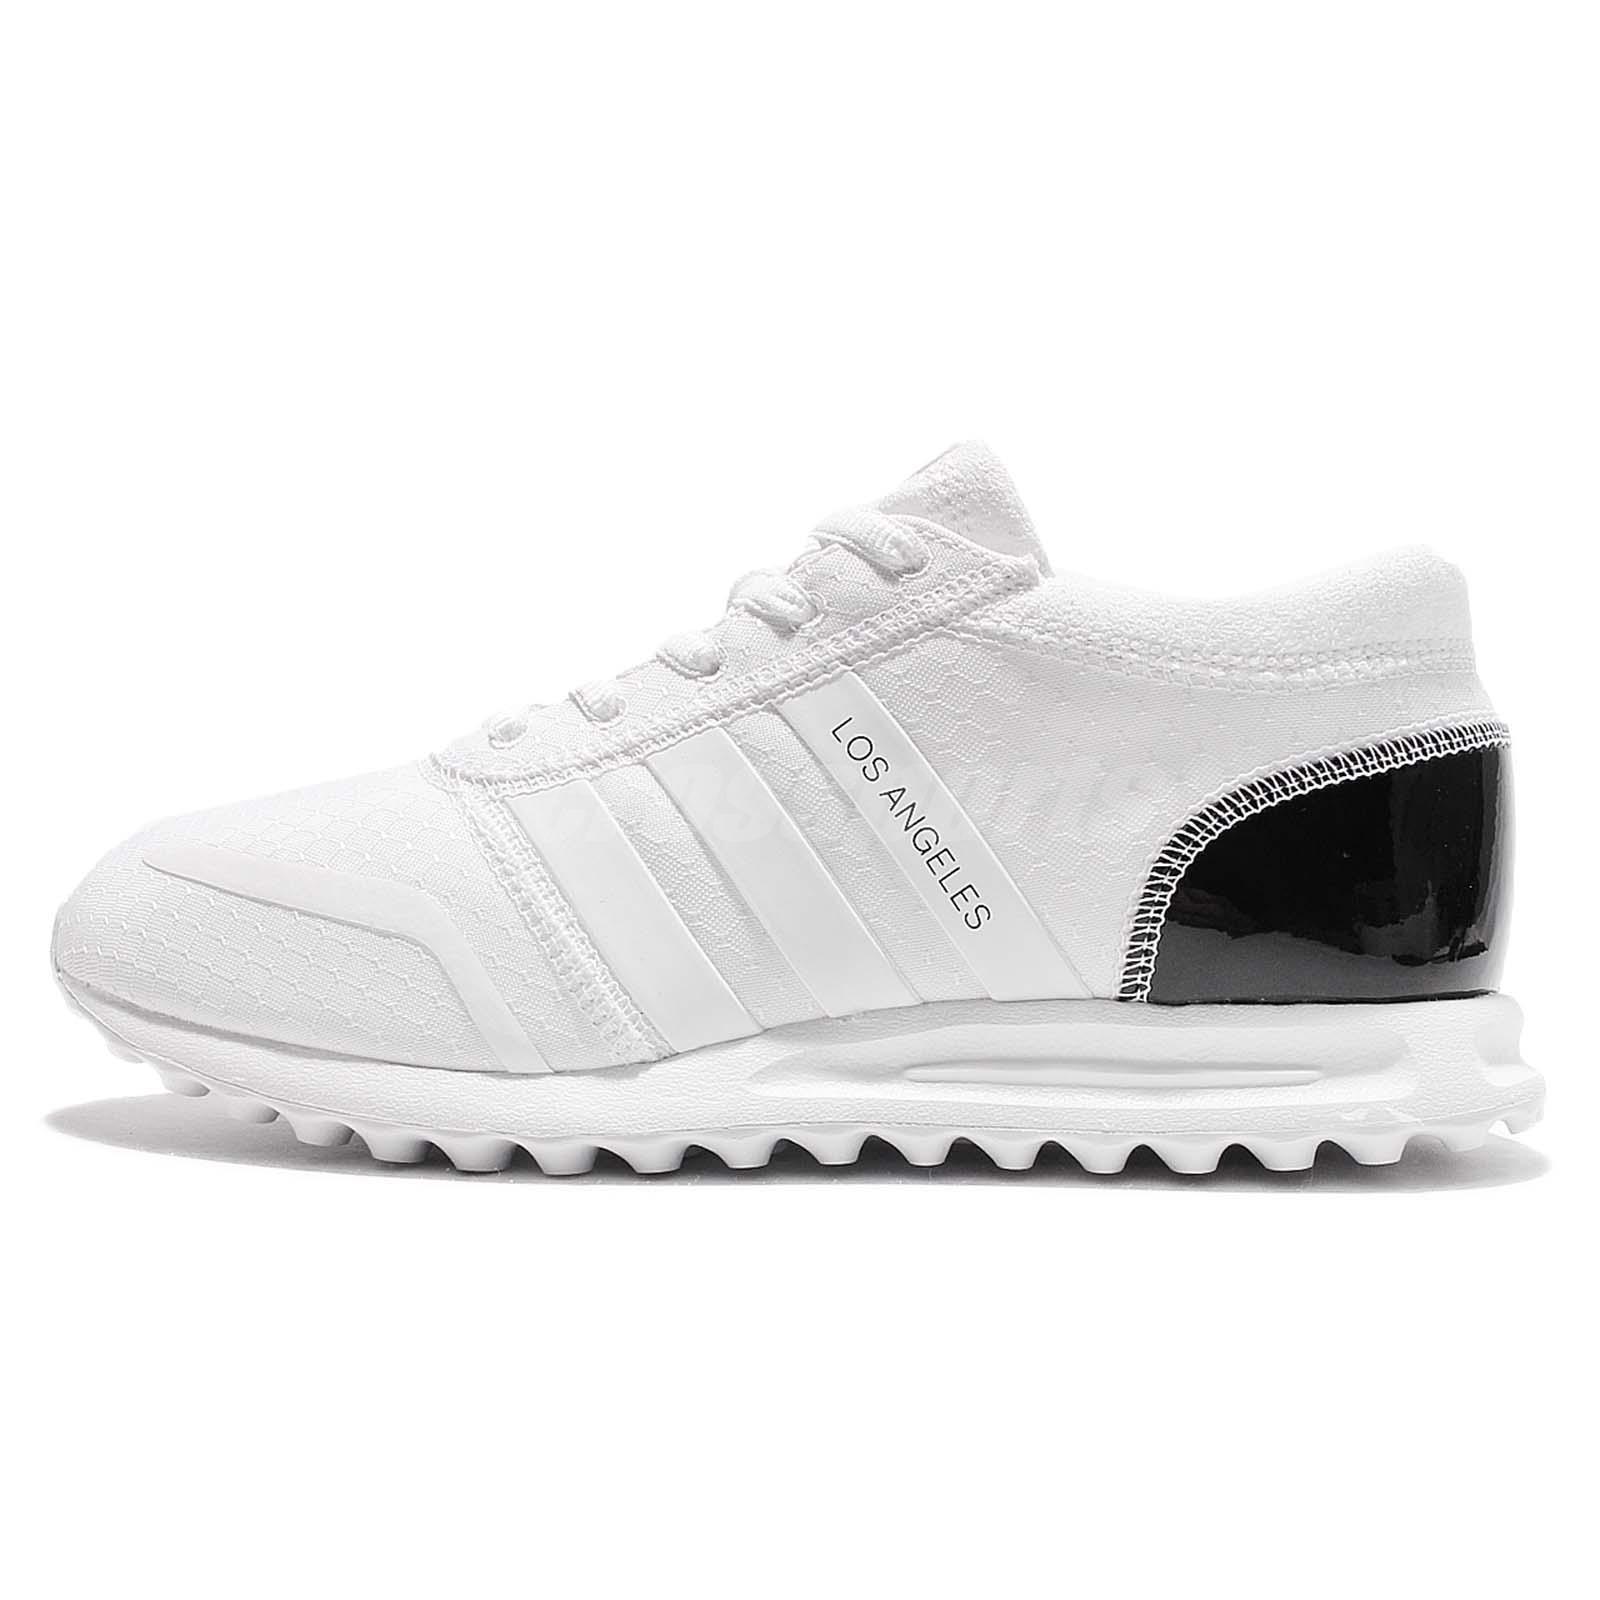 adidas Originals Los Angeles W White Black Women Running Shoe LA Trainers  S79765